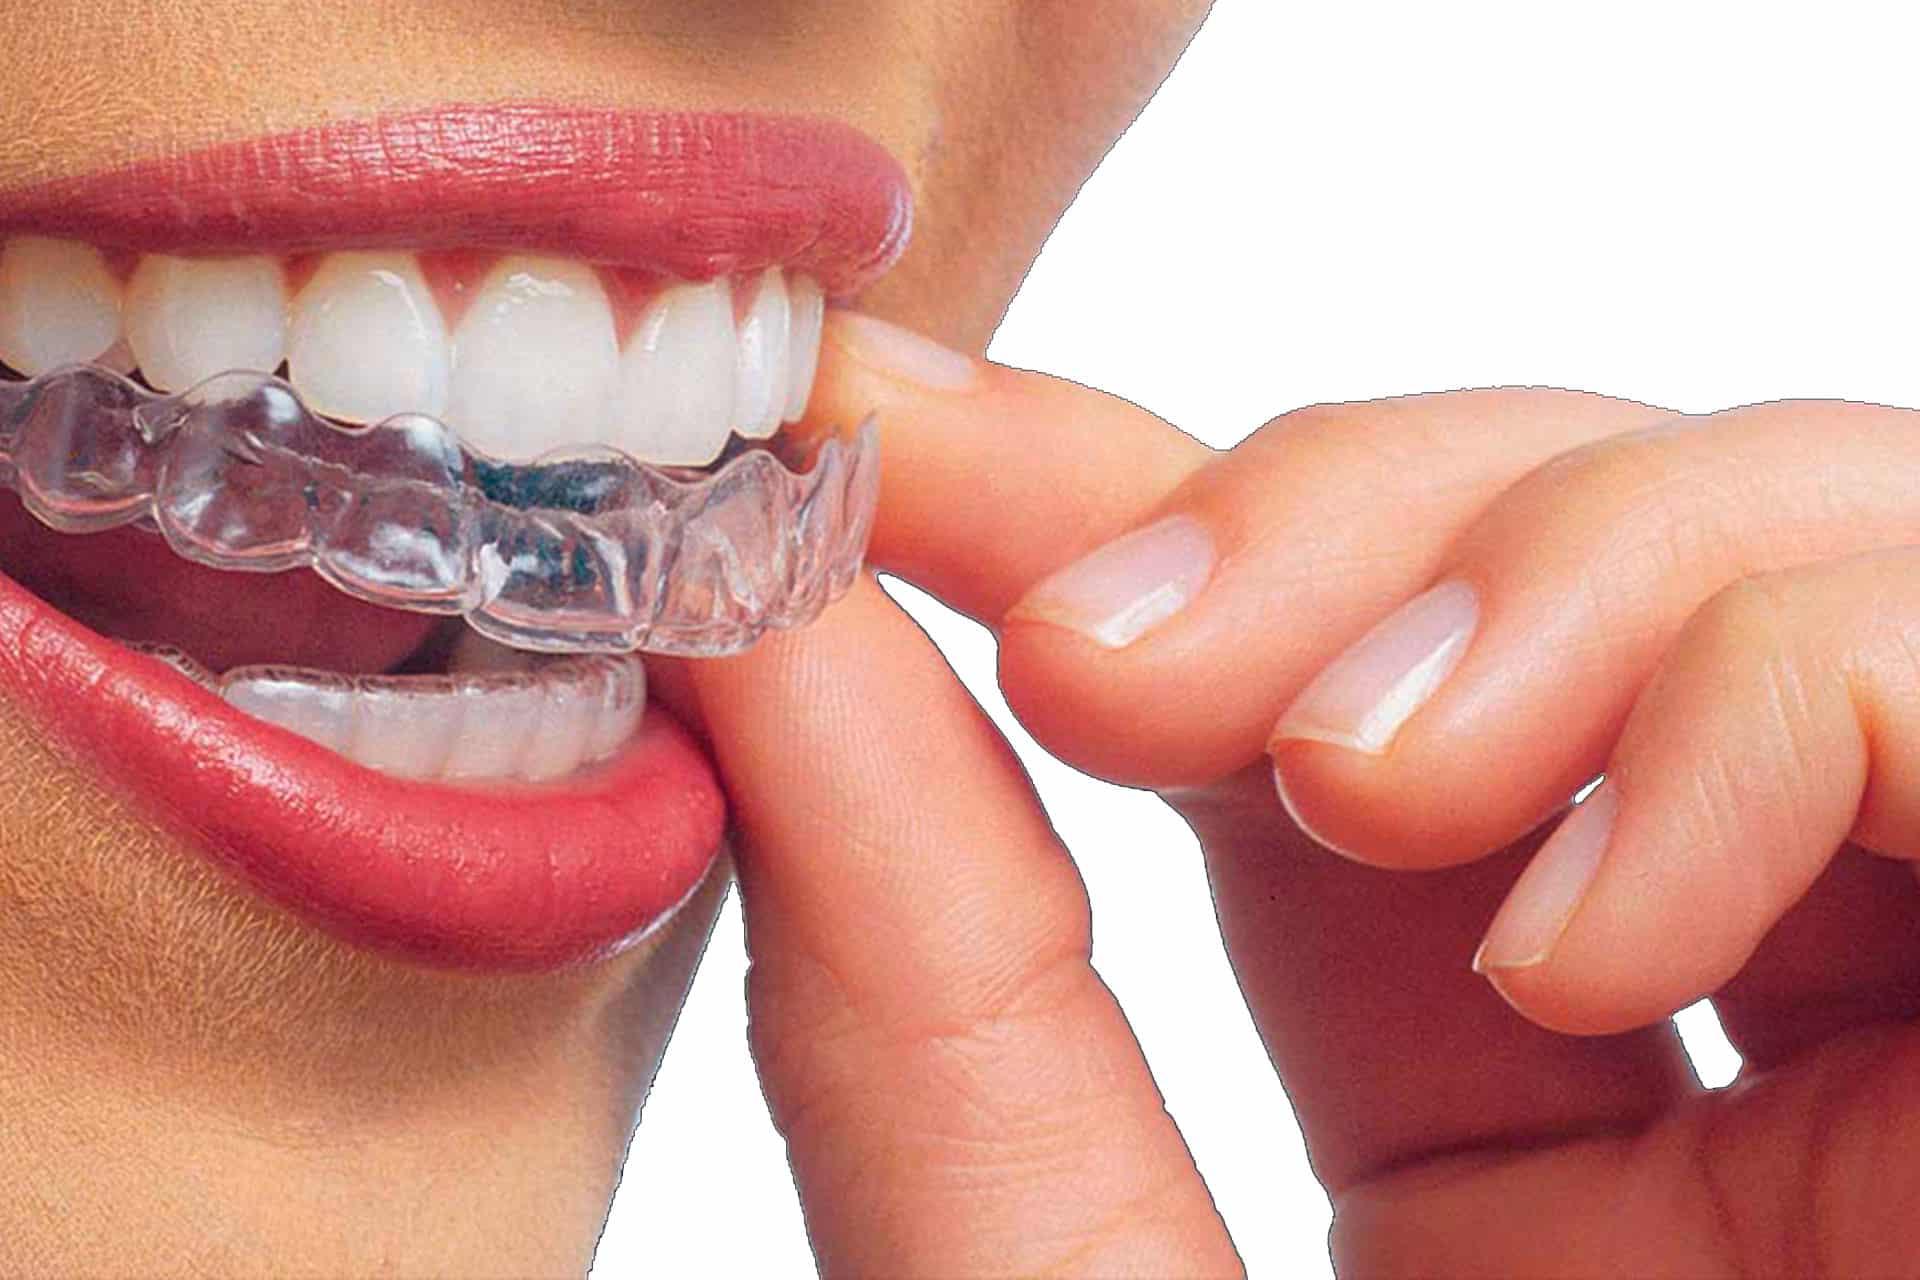 Invisalign Alcorcón. Ortodoncia invisible con financiación en Clínica Dental CEM Valderas